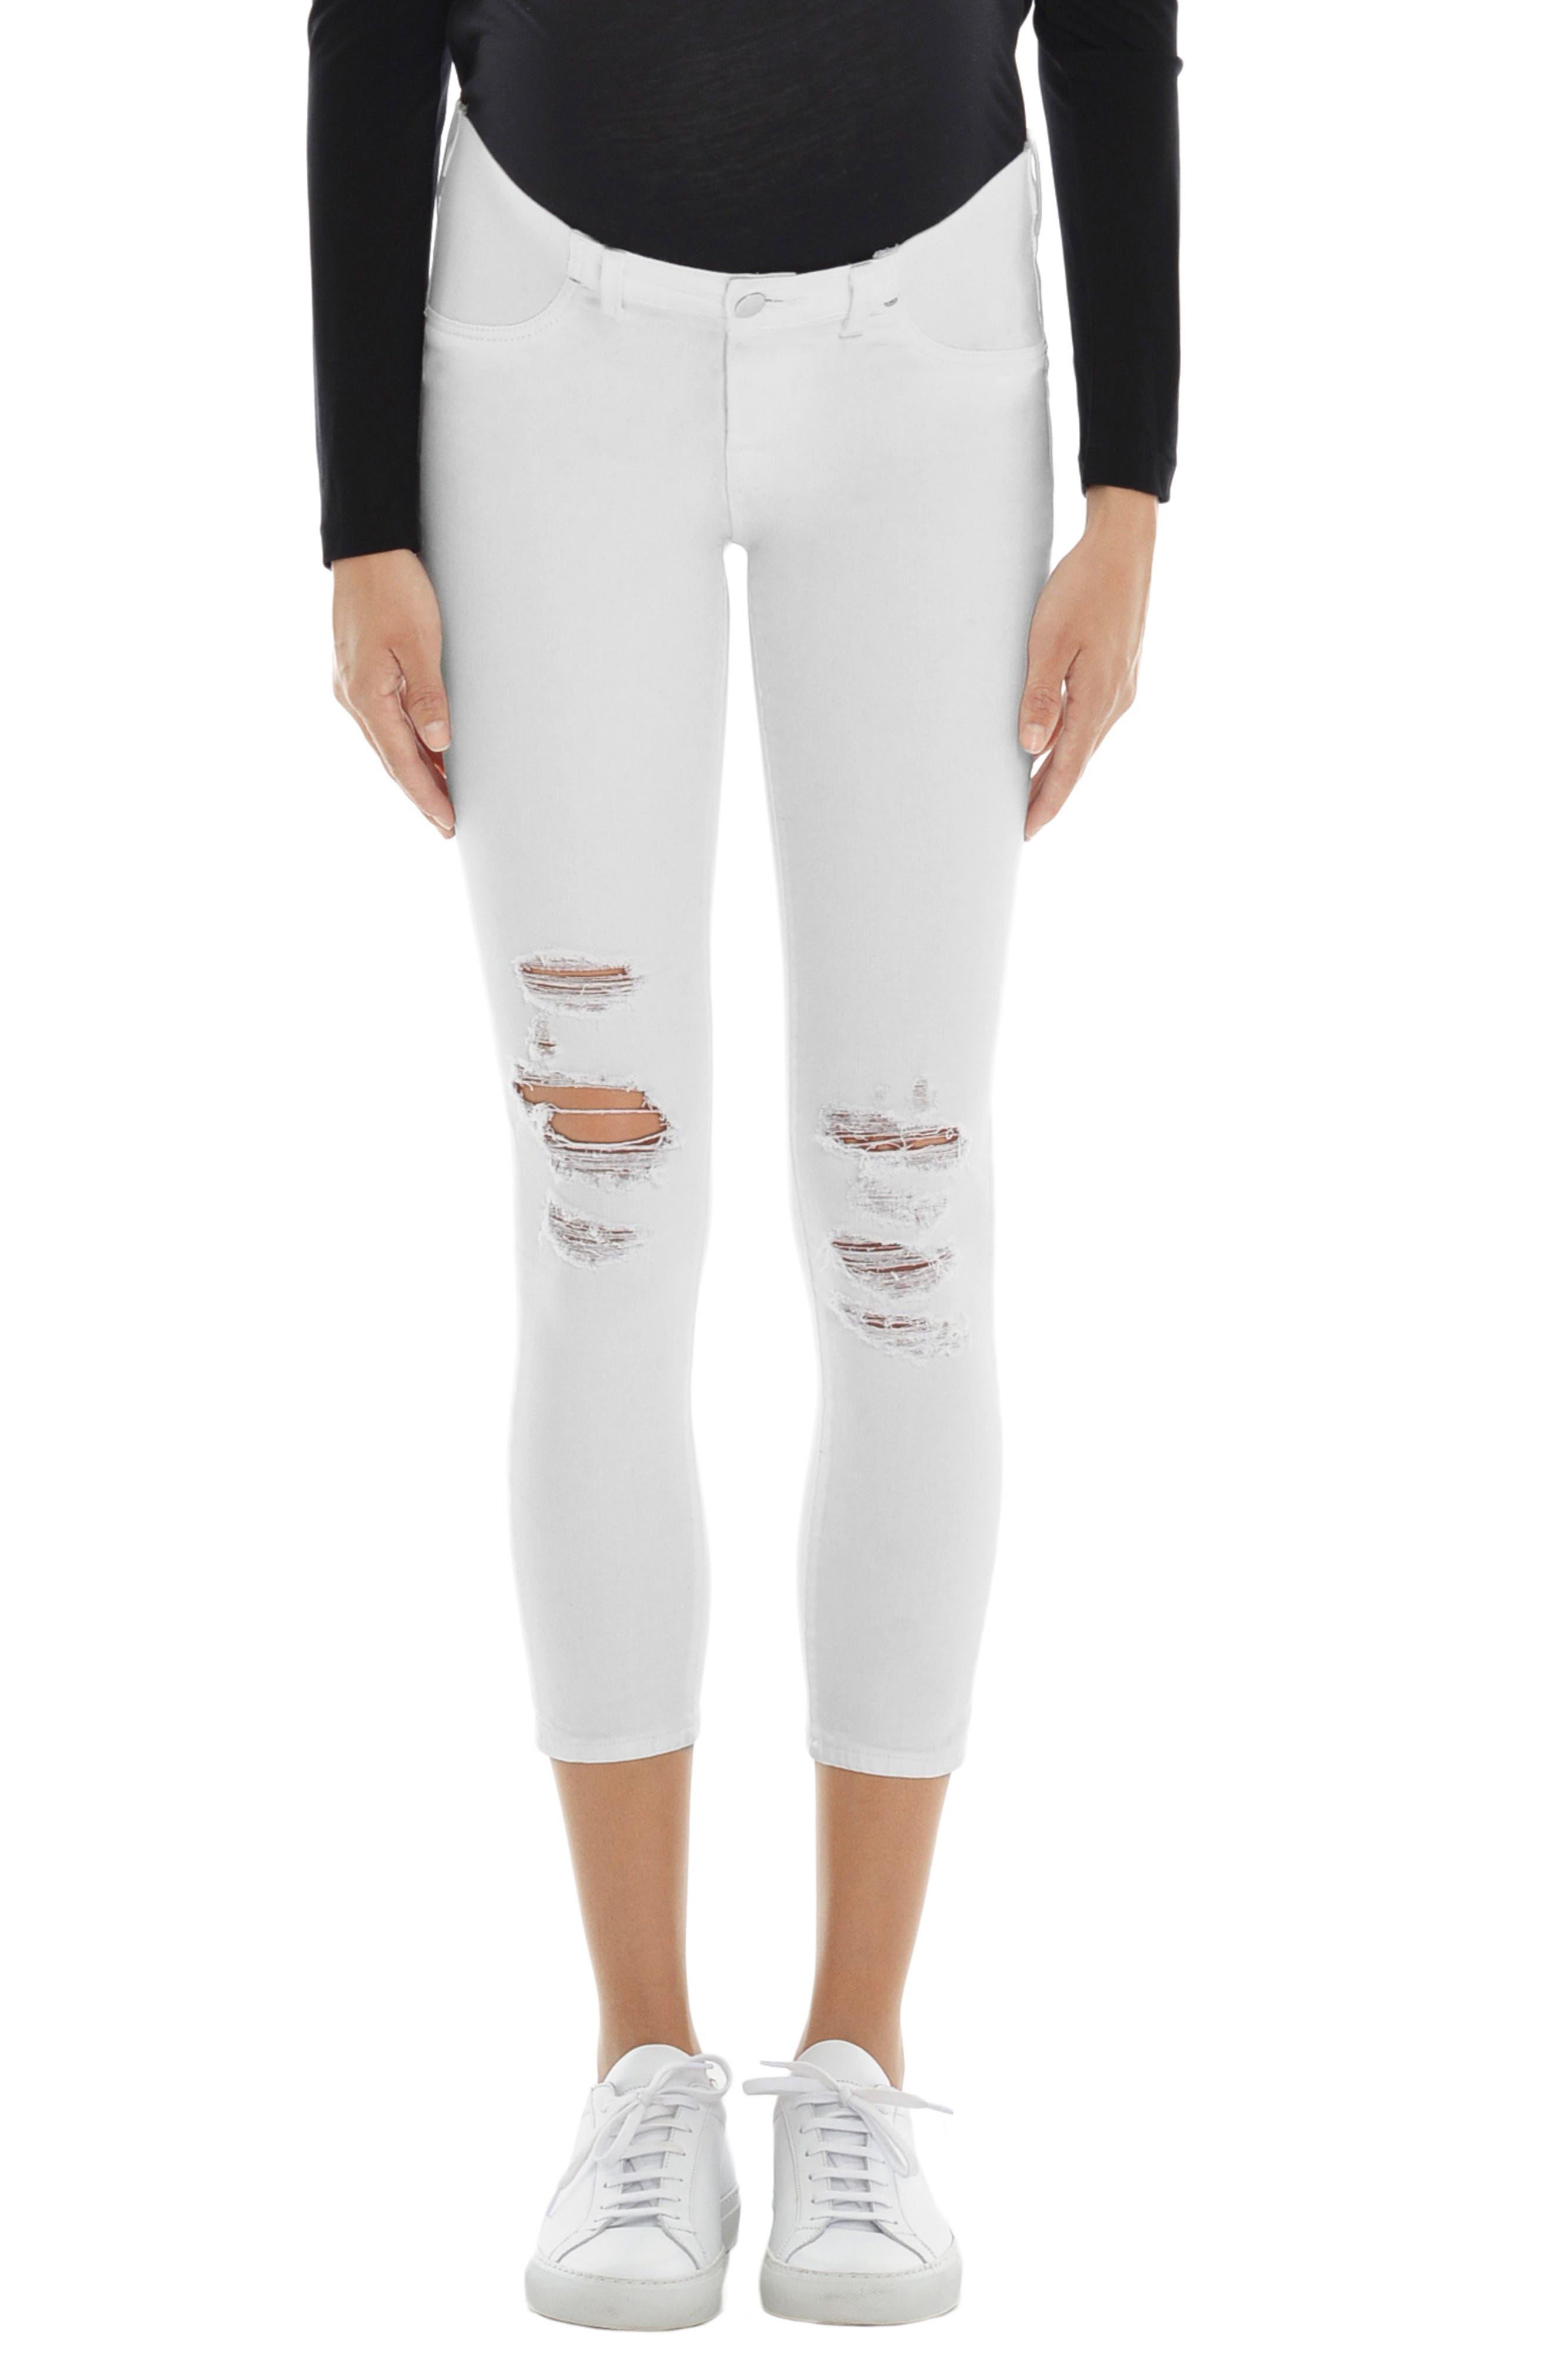 Mama J Maternity Capri Jeans,                         Main,                         color, 100